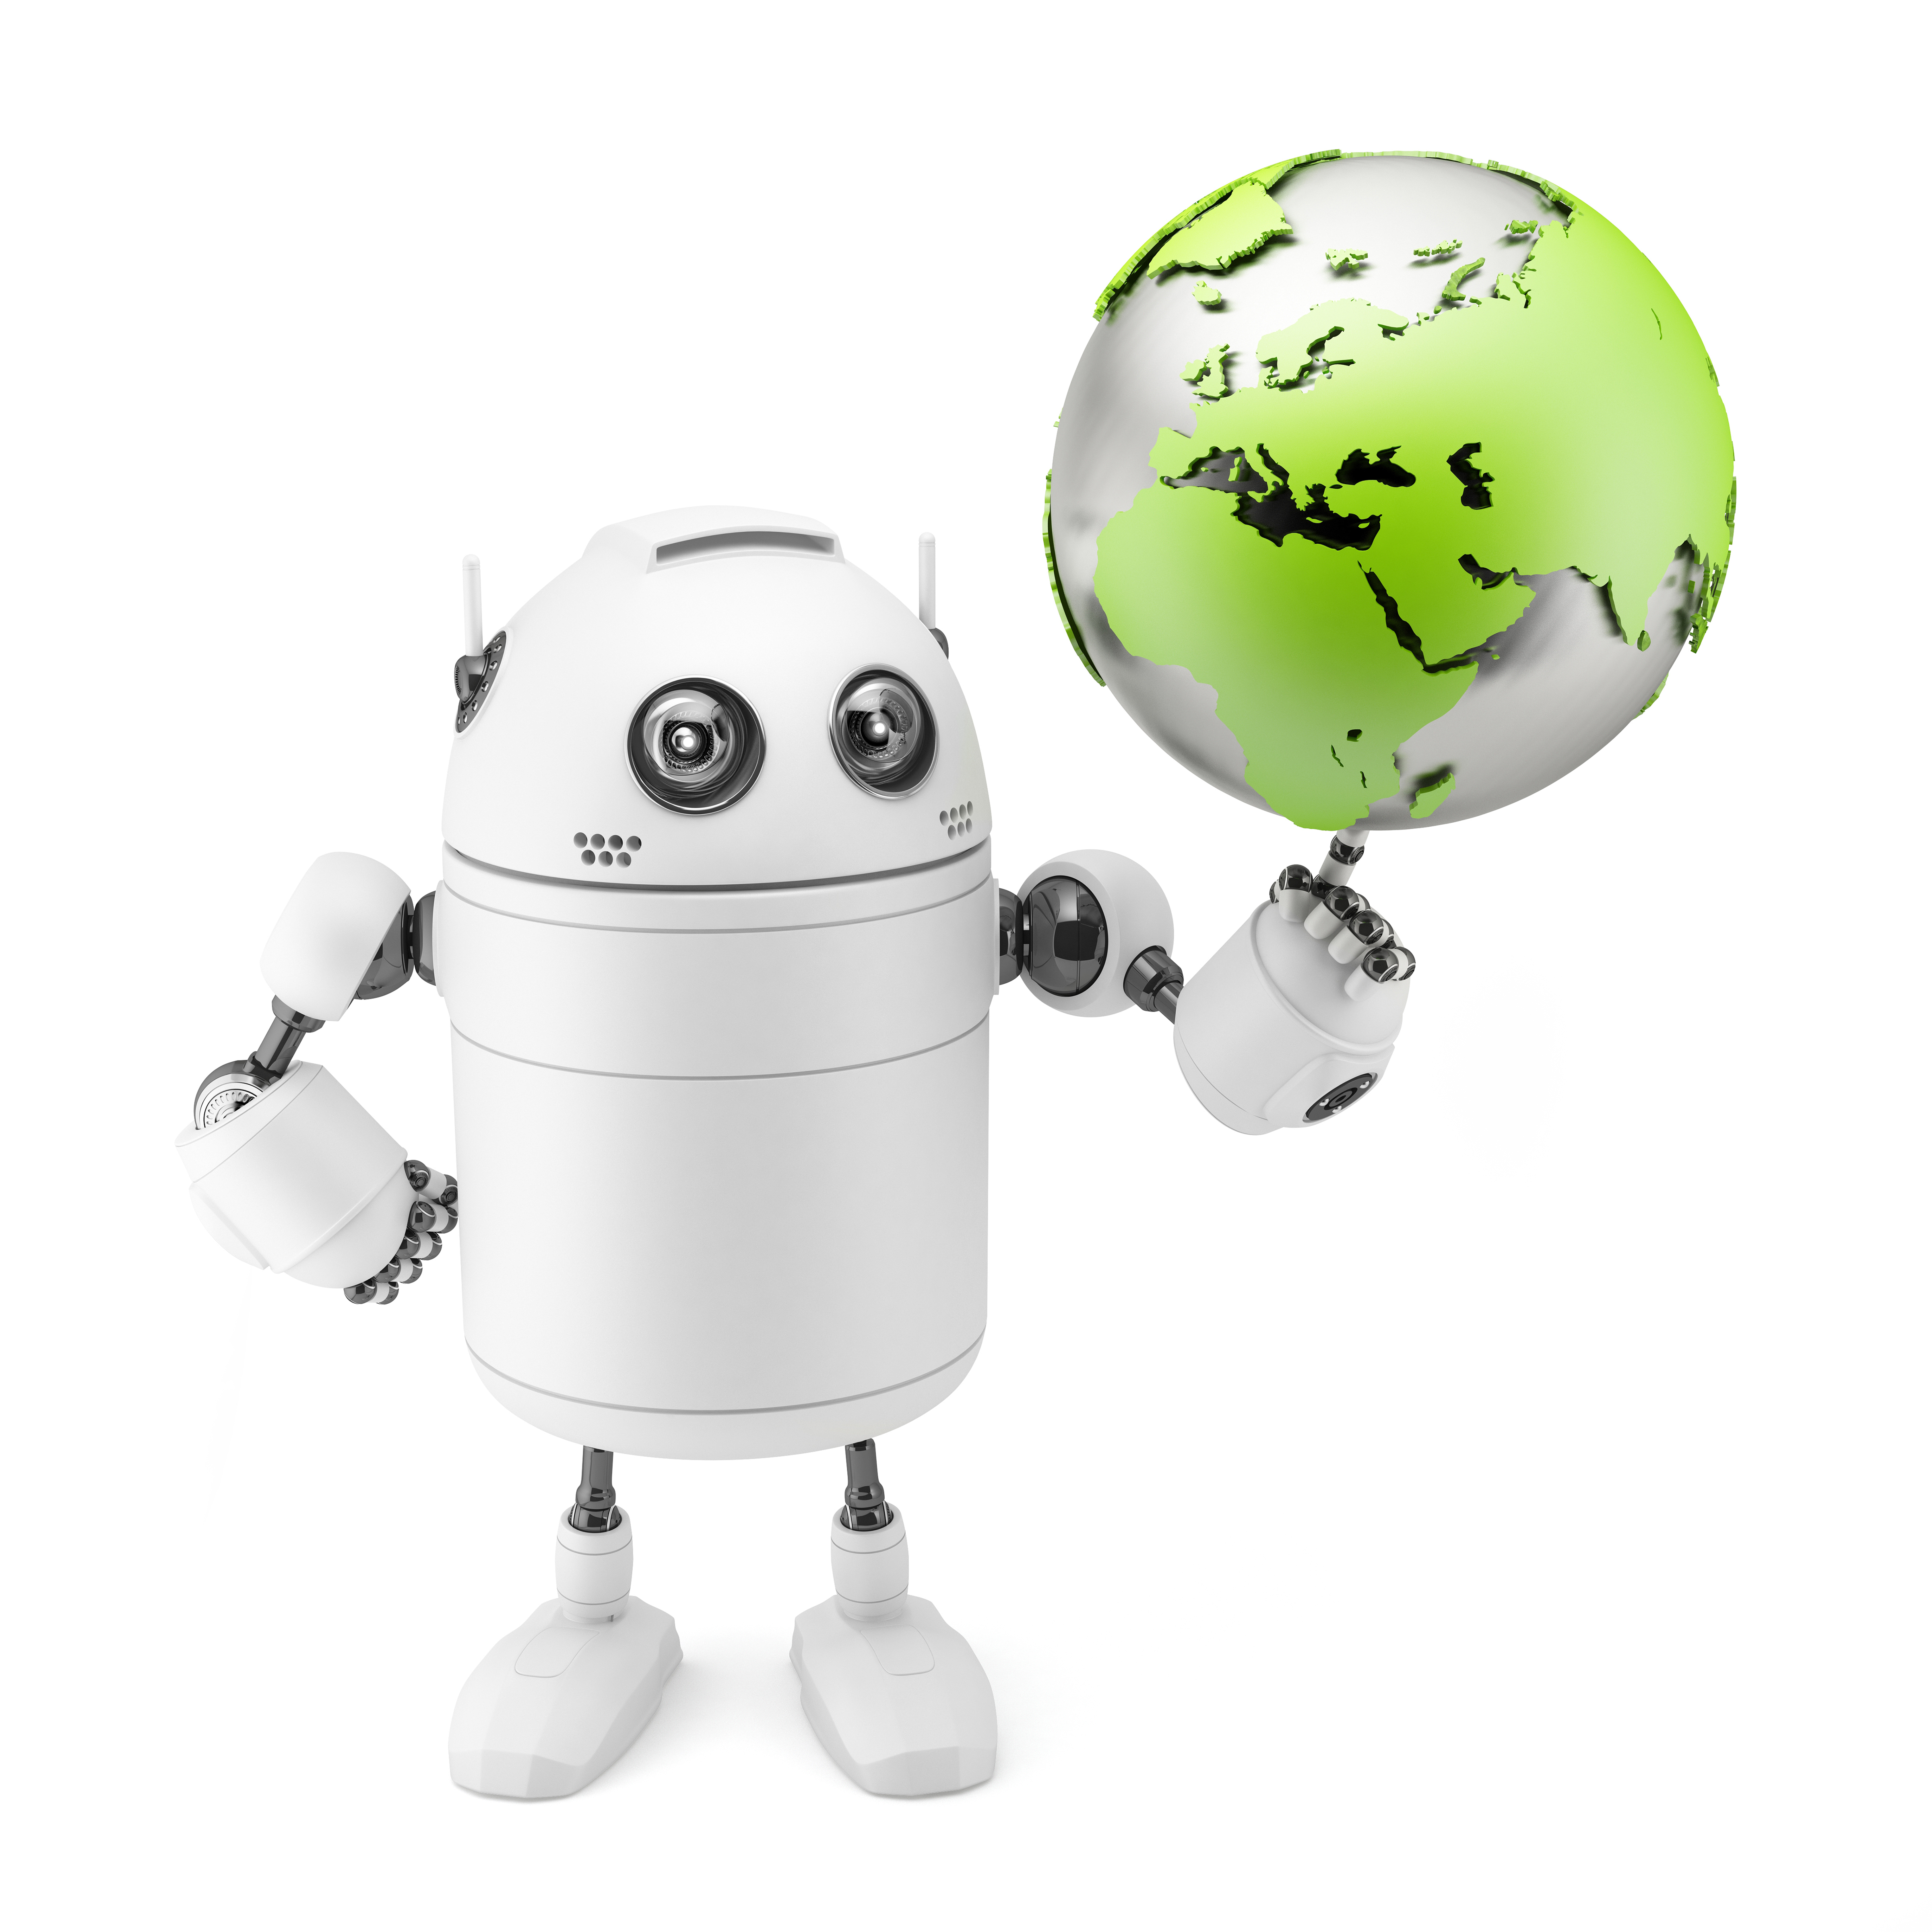 Robots and Society